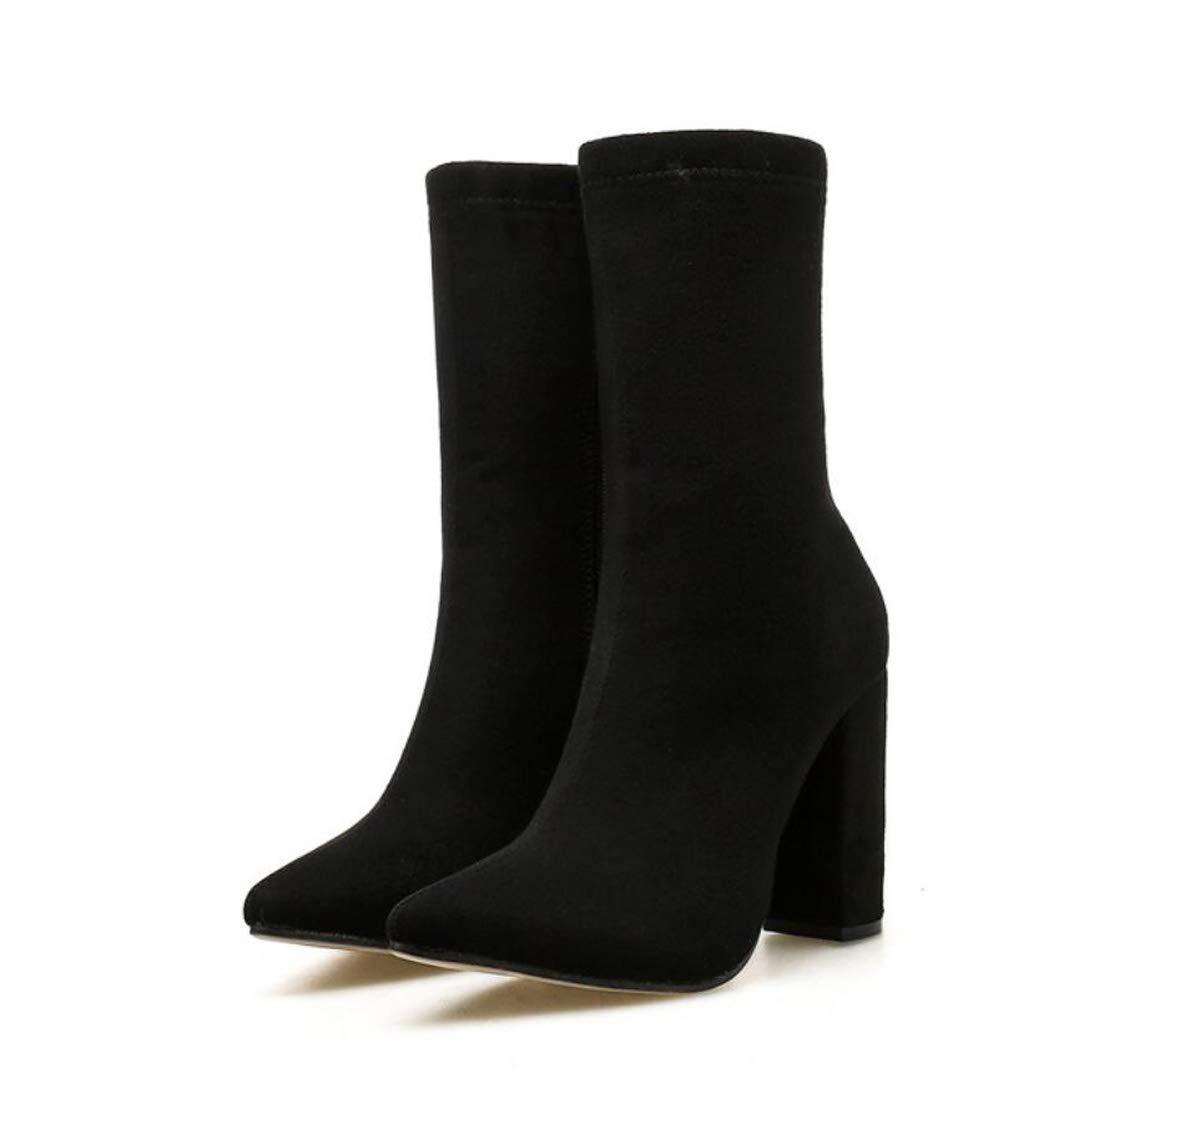 DANDANJIE Damen Stiefel High Heel Mid Kalb Stiefel Casual Reißverschluss wies Zehenschuhe für Herbst Winter 2019 schwarz 38EU